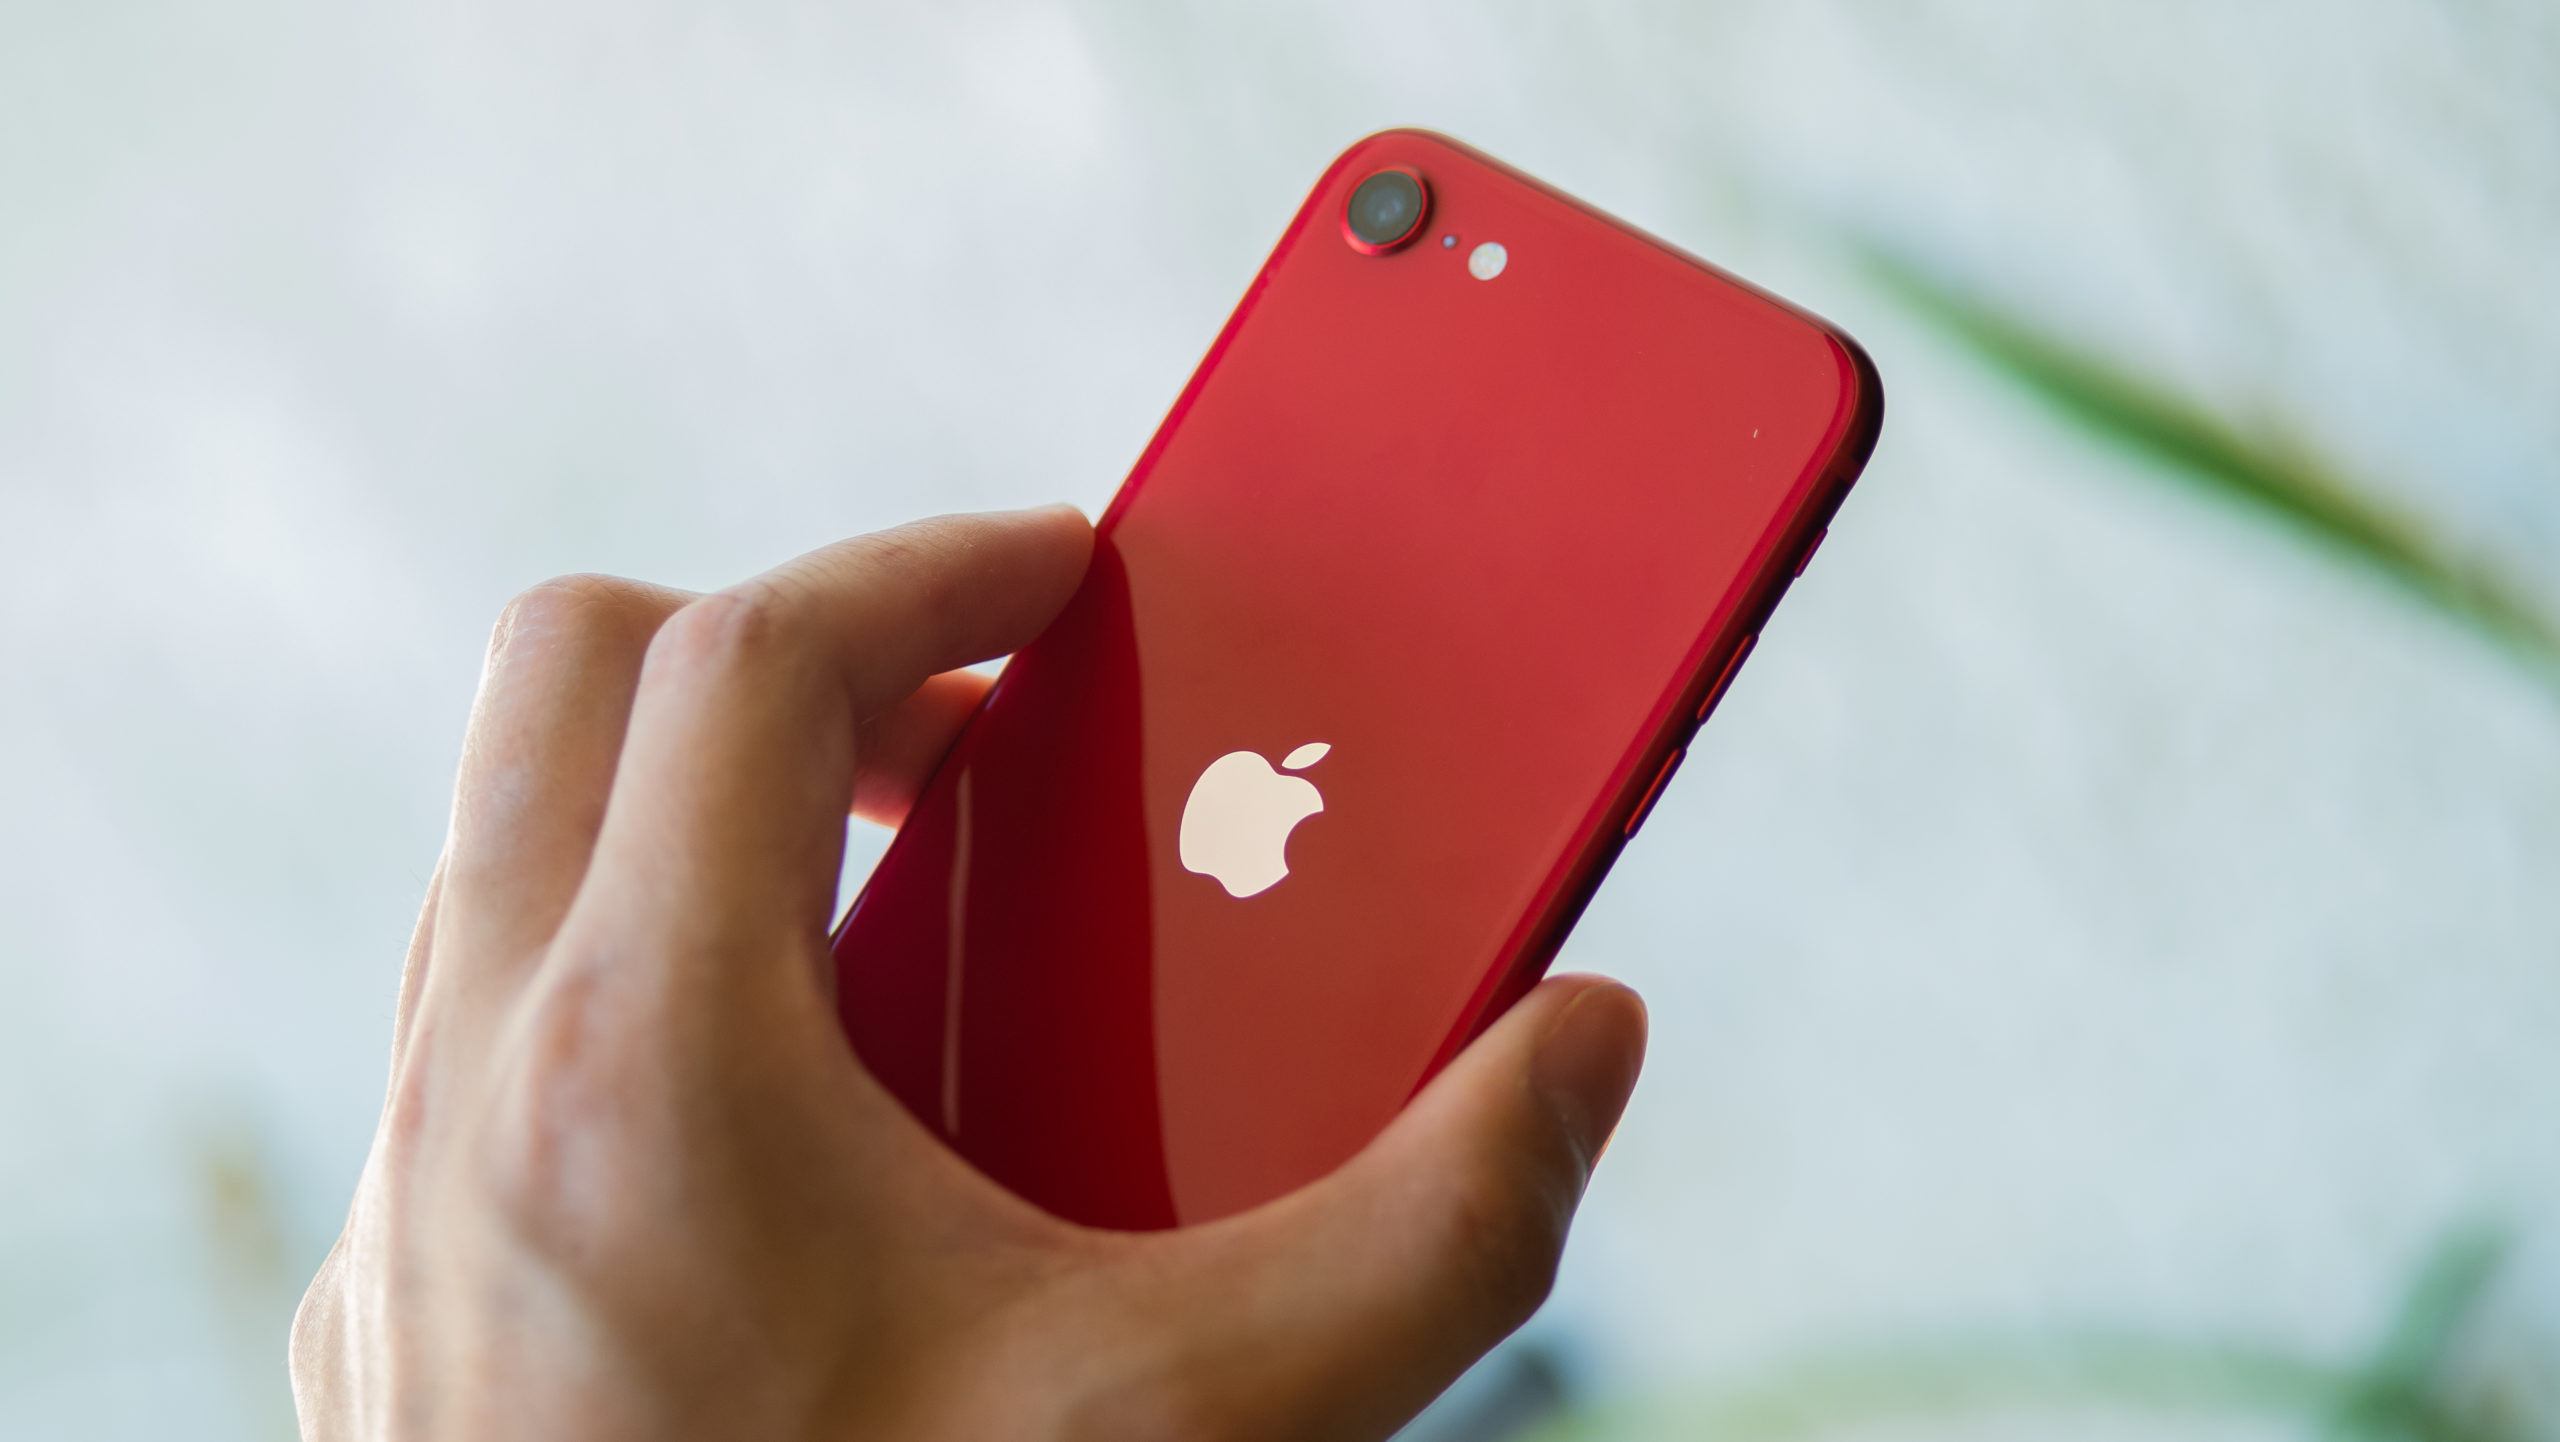 Apple planeja abrir sua loja online na Índia no próximo mês: Relatório [Update: Apple India statement] 1